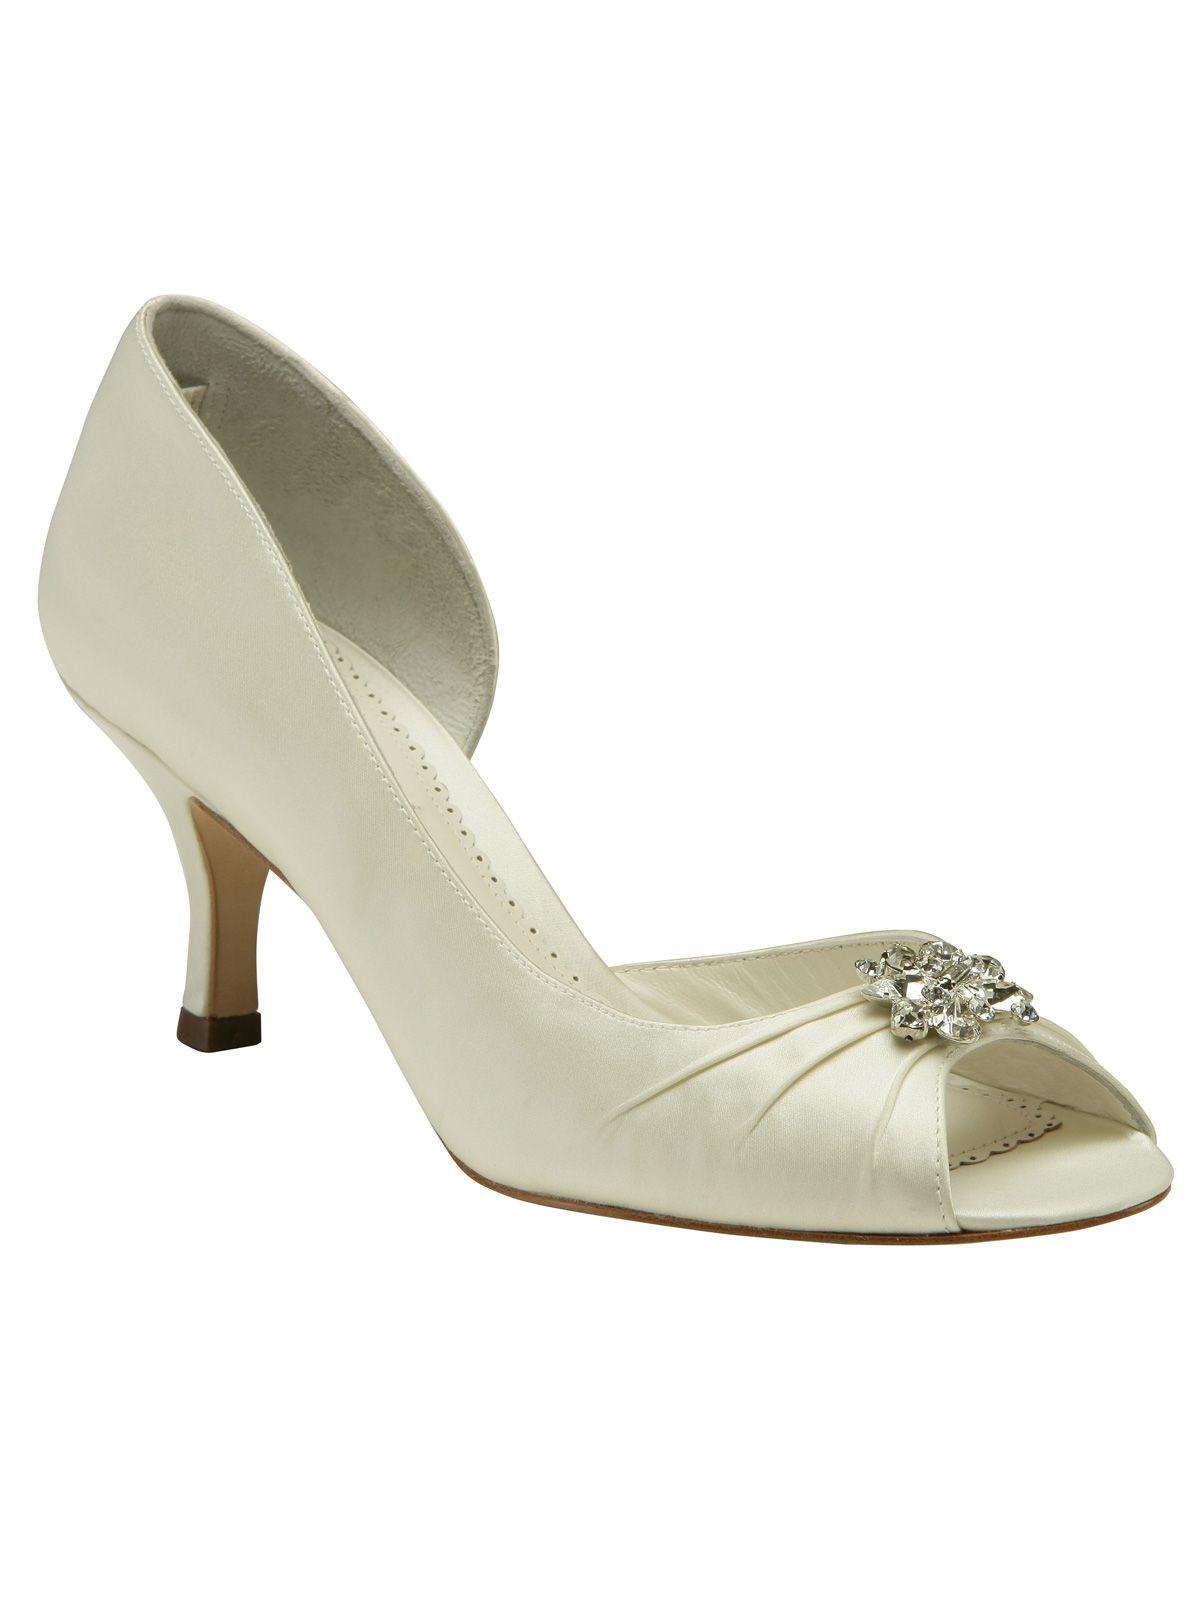 6fe8da6af4b The classic antique inspired wedding shoe